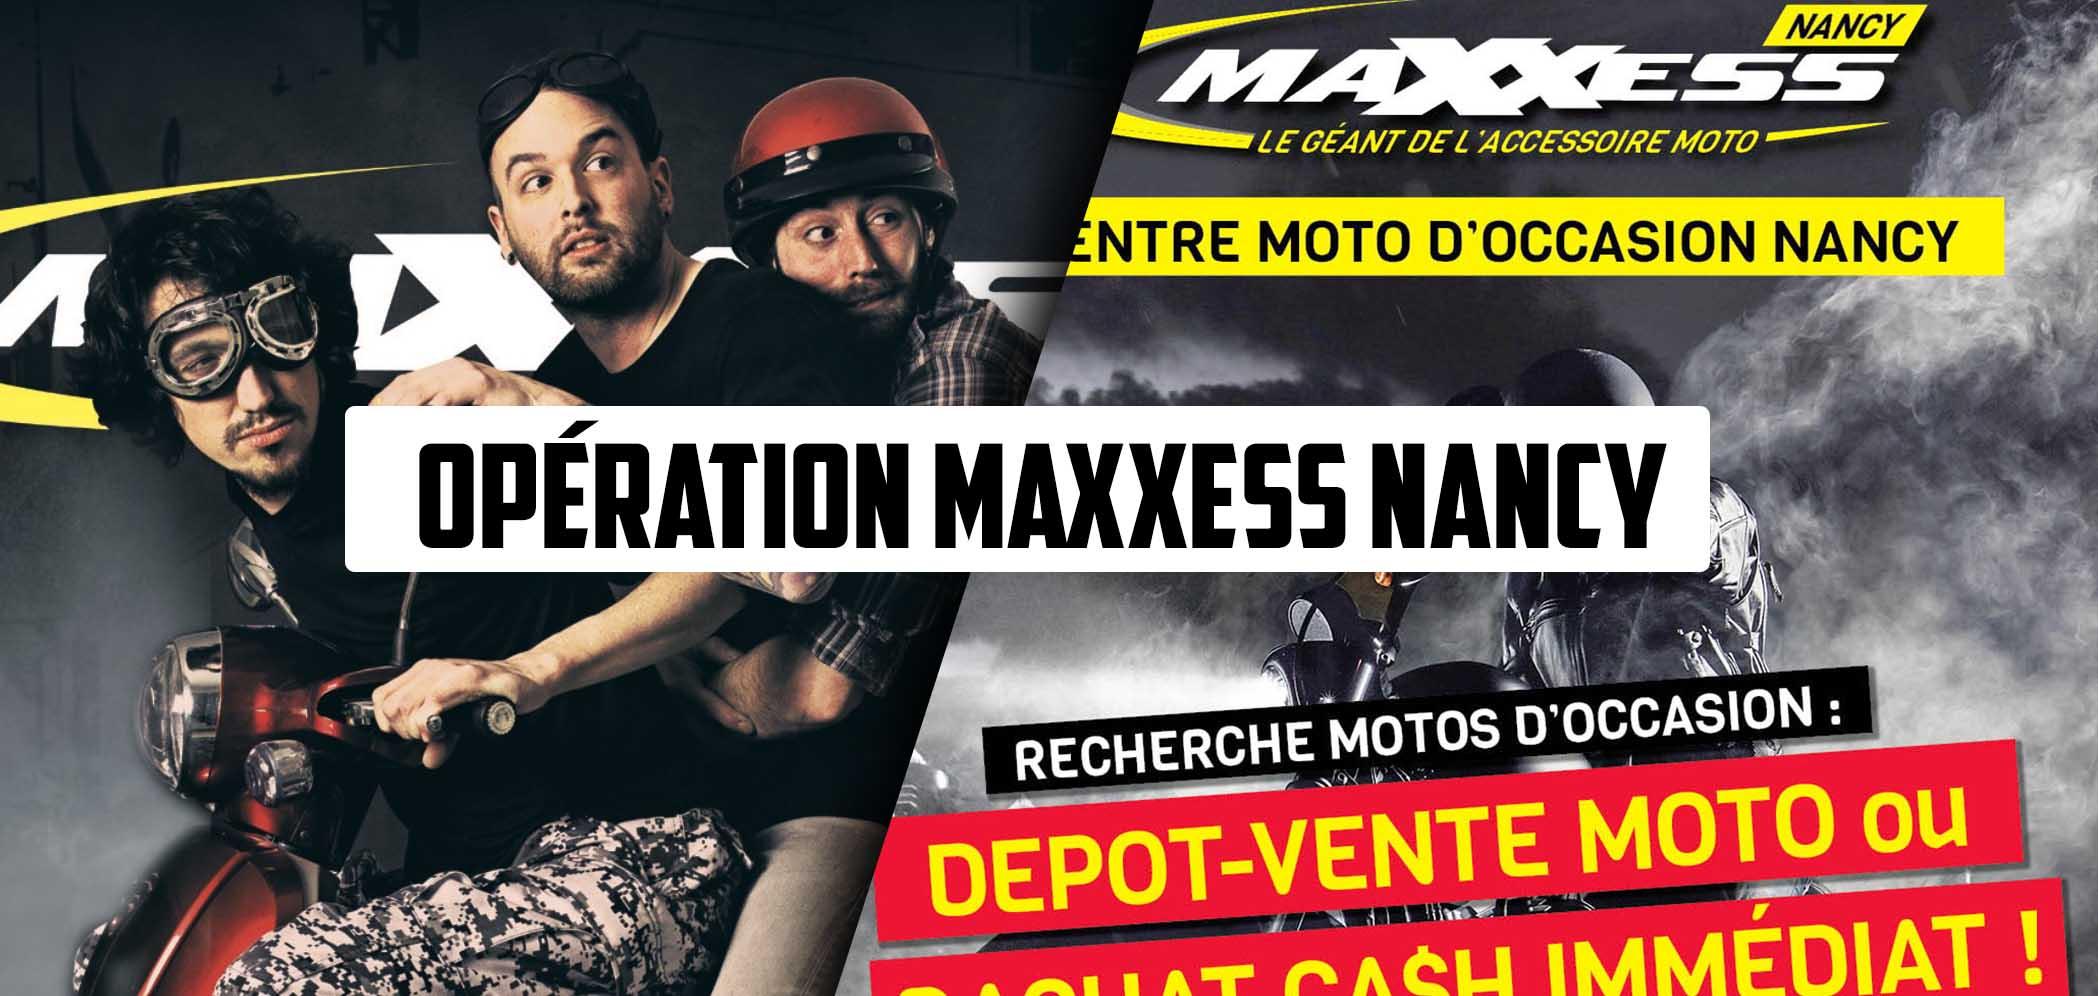 MAXXESS NANCY